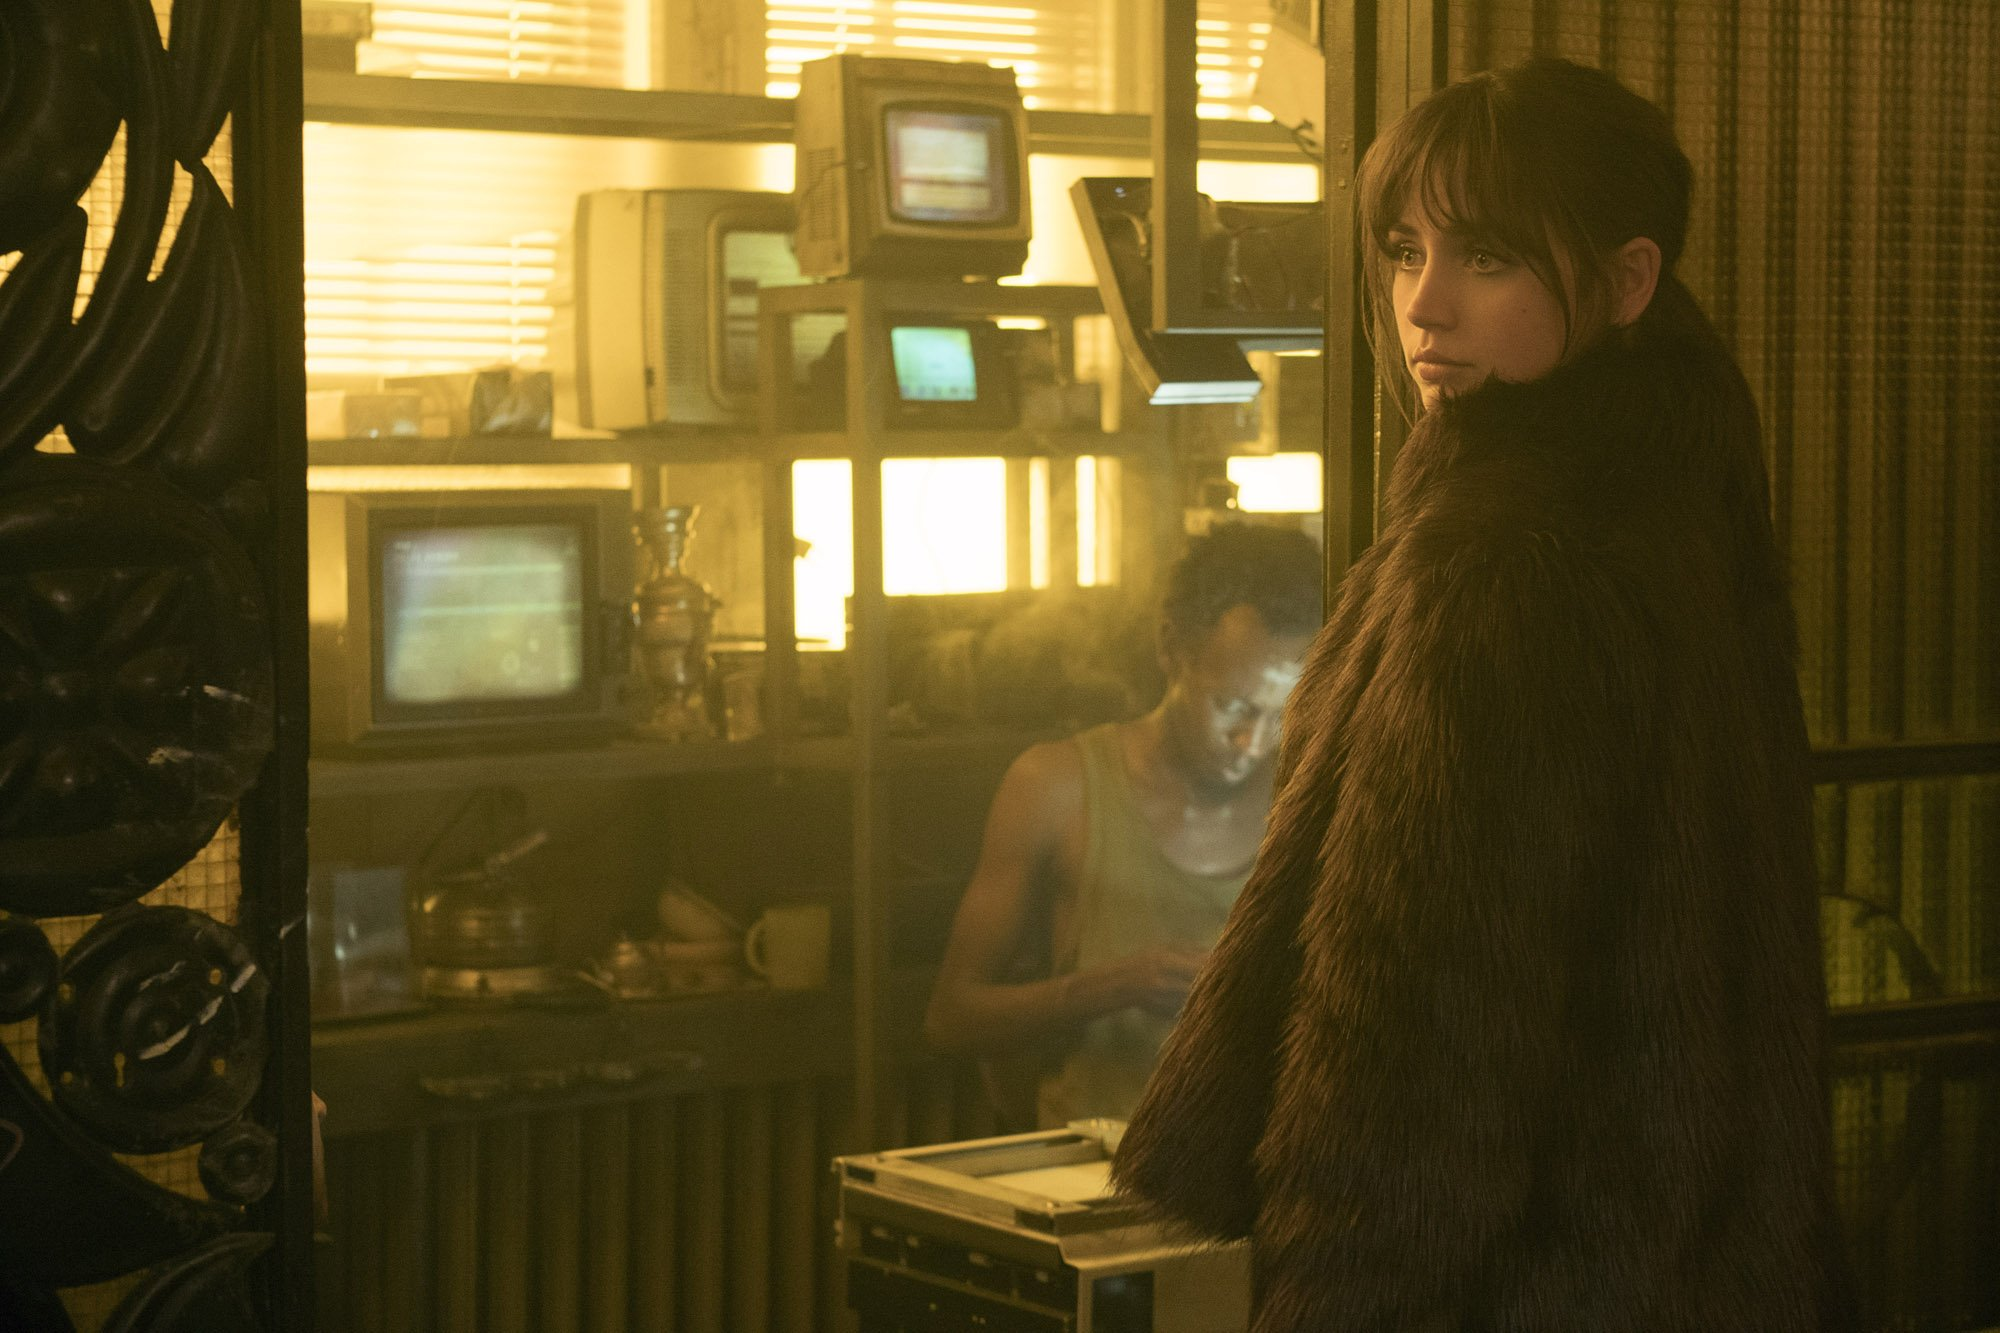 Photo du film Blade Runner 2049 avec Joi (Ana de Armas)